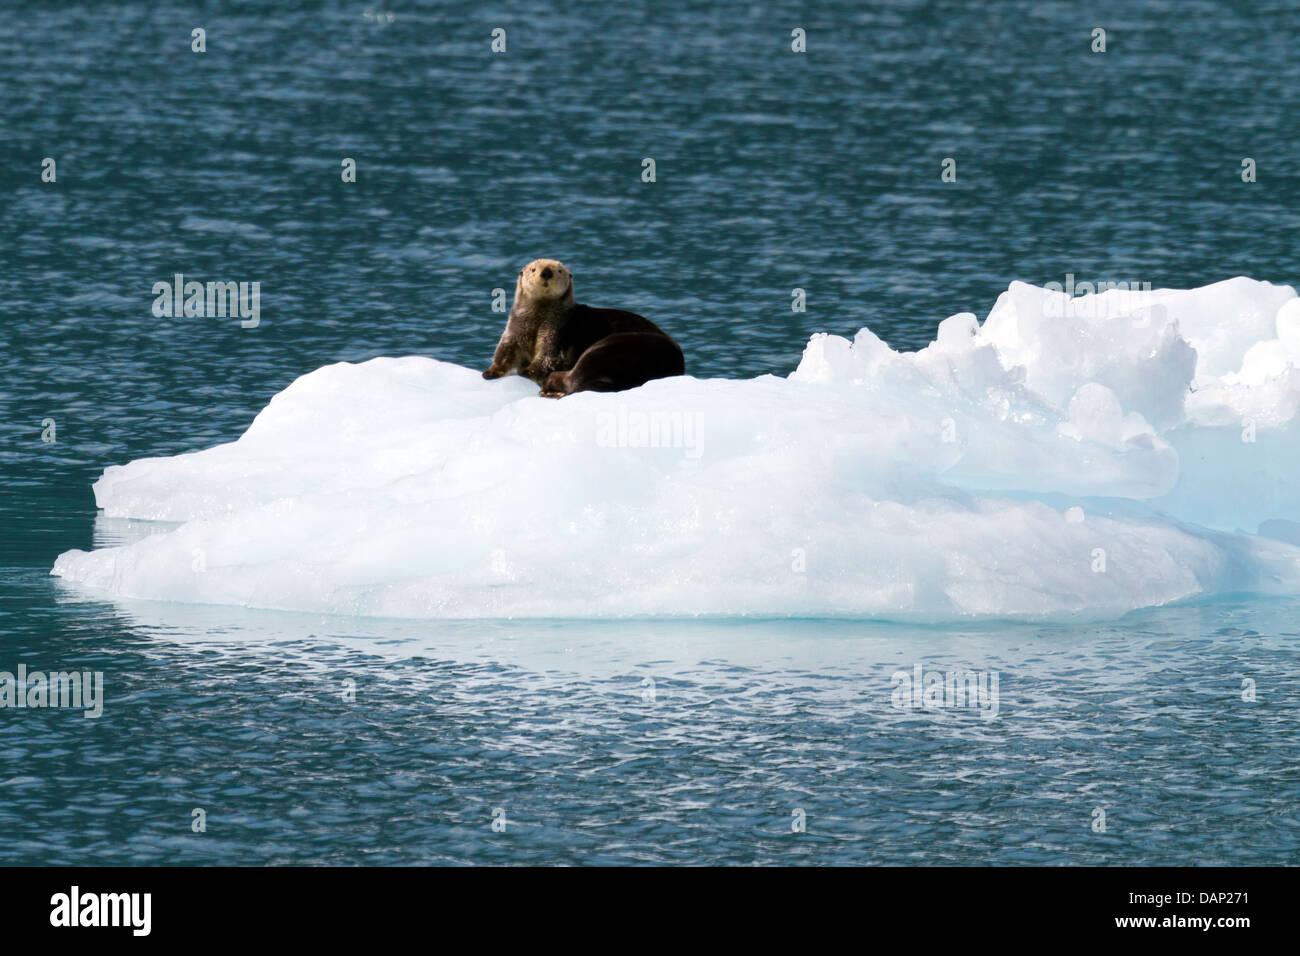 sea otter on ice berg - Stock Image